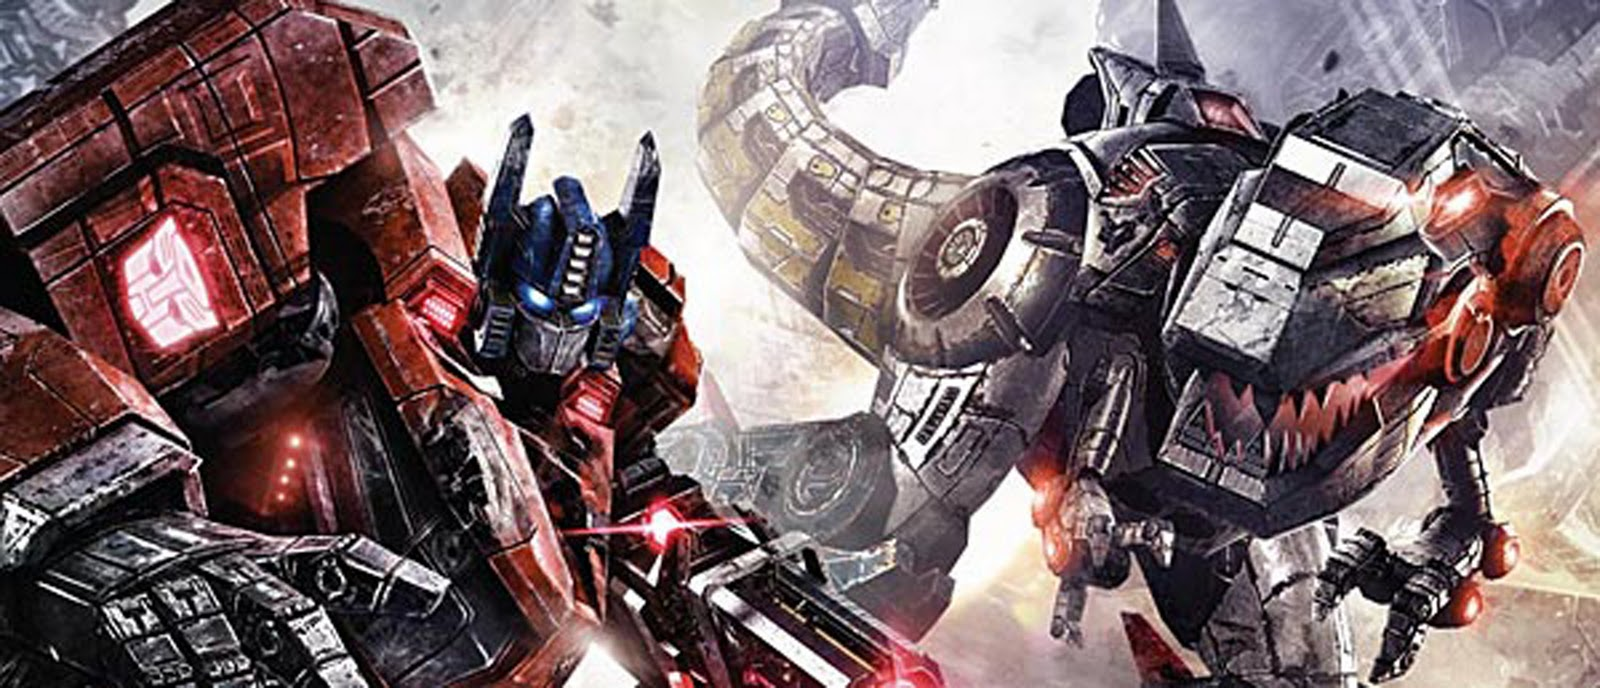 Fall Max Payne Hd Wallpapers Chidi Okonkwo S Blog Transformers Fall Of Cybertron